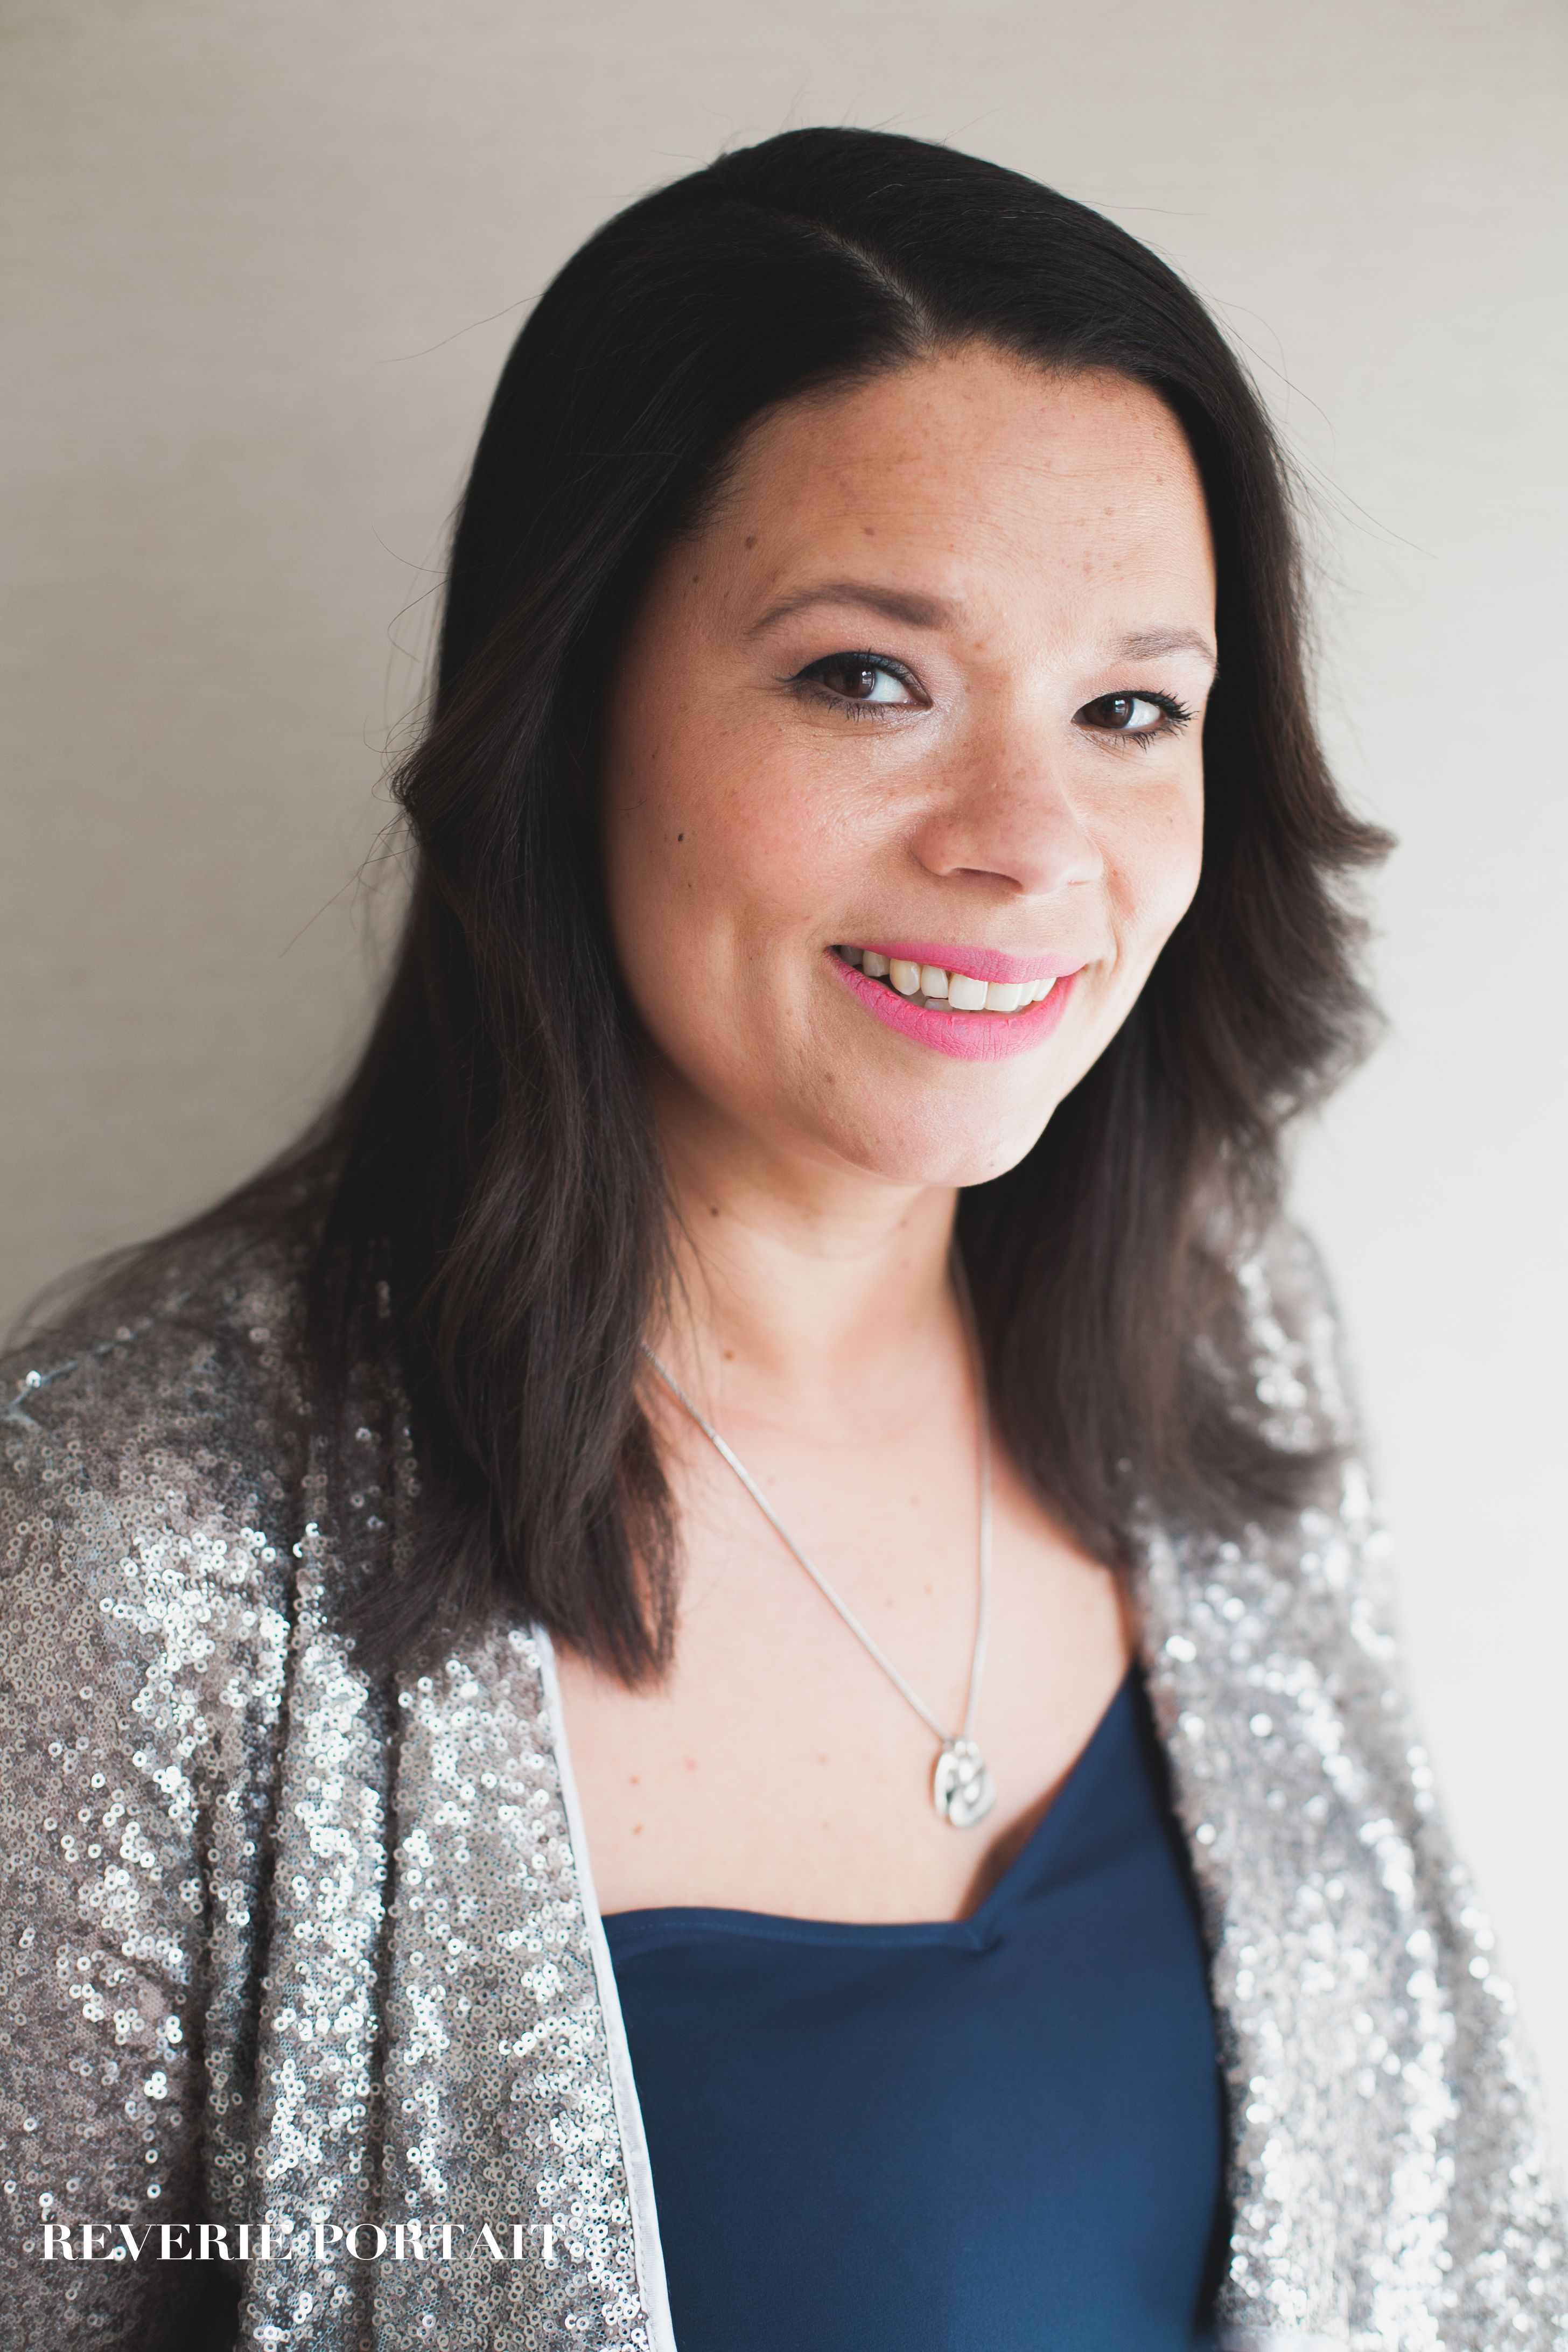 Professional Portrait, women's business photography, Personal Branding Photography by Reverie Portrait UK.  Personal Branding and Marketing expert, Katie Wilson at http://exceptionalwomen.net/  www.reverieportrait.com